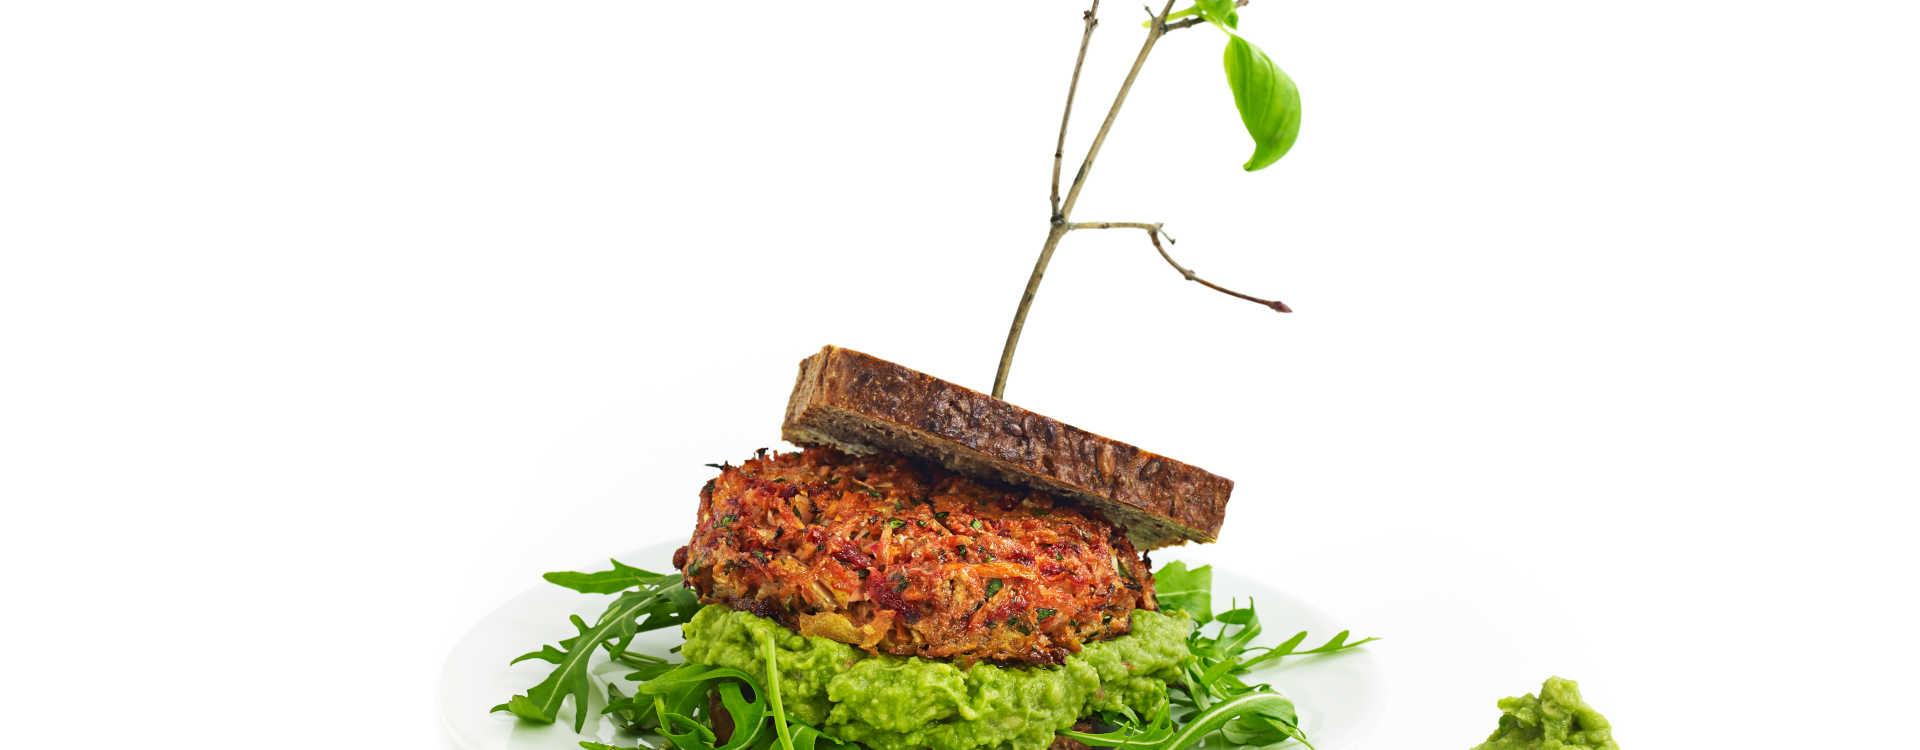 Grønnsaksburgere på rugbrød md limeaioli